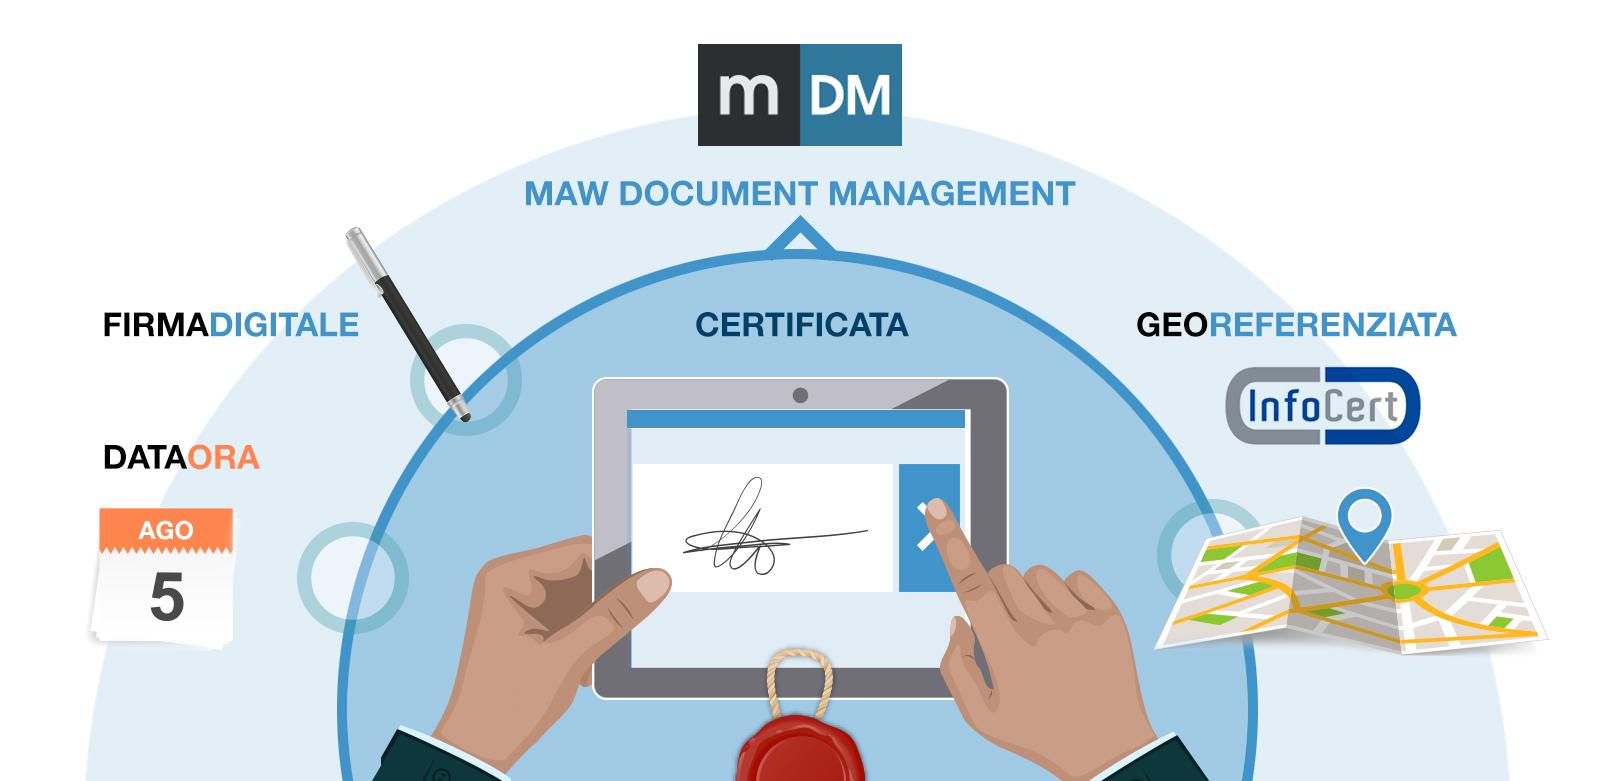 firma_digitale_georeferenziata_mdm